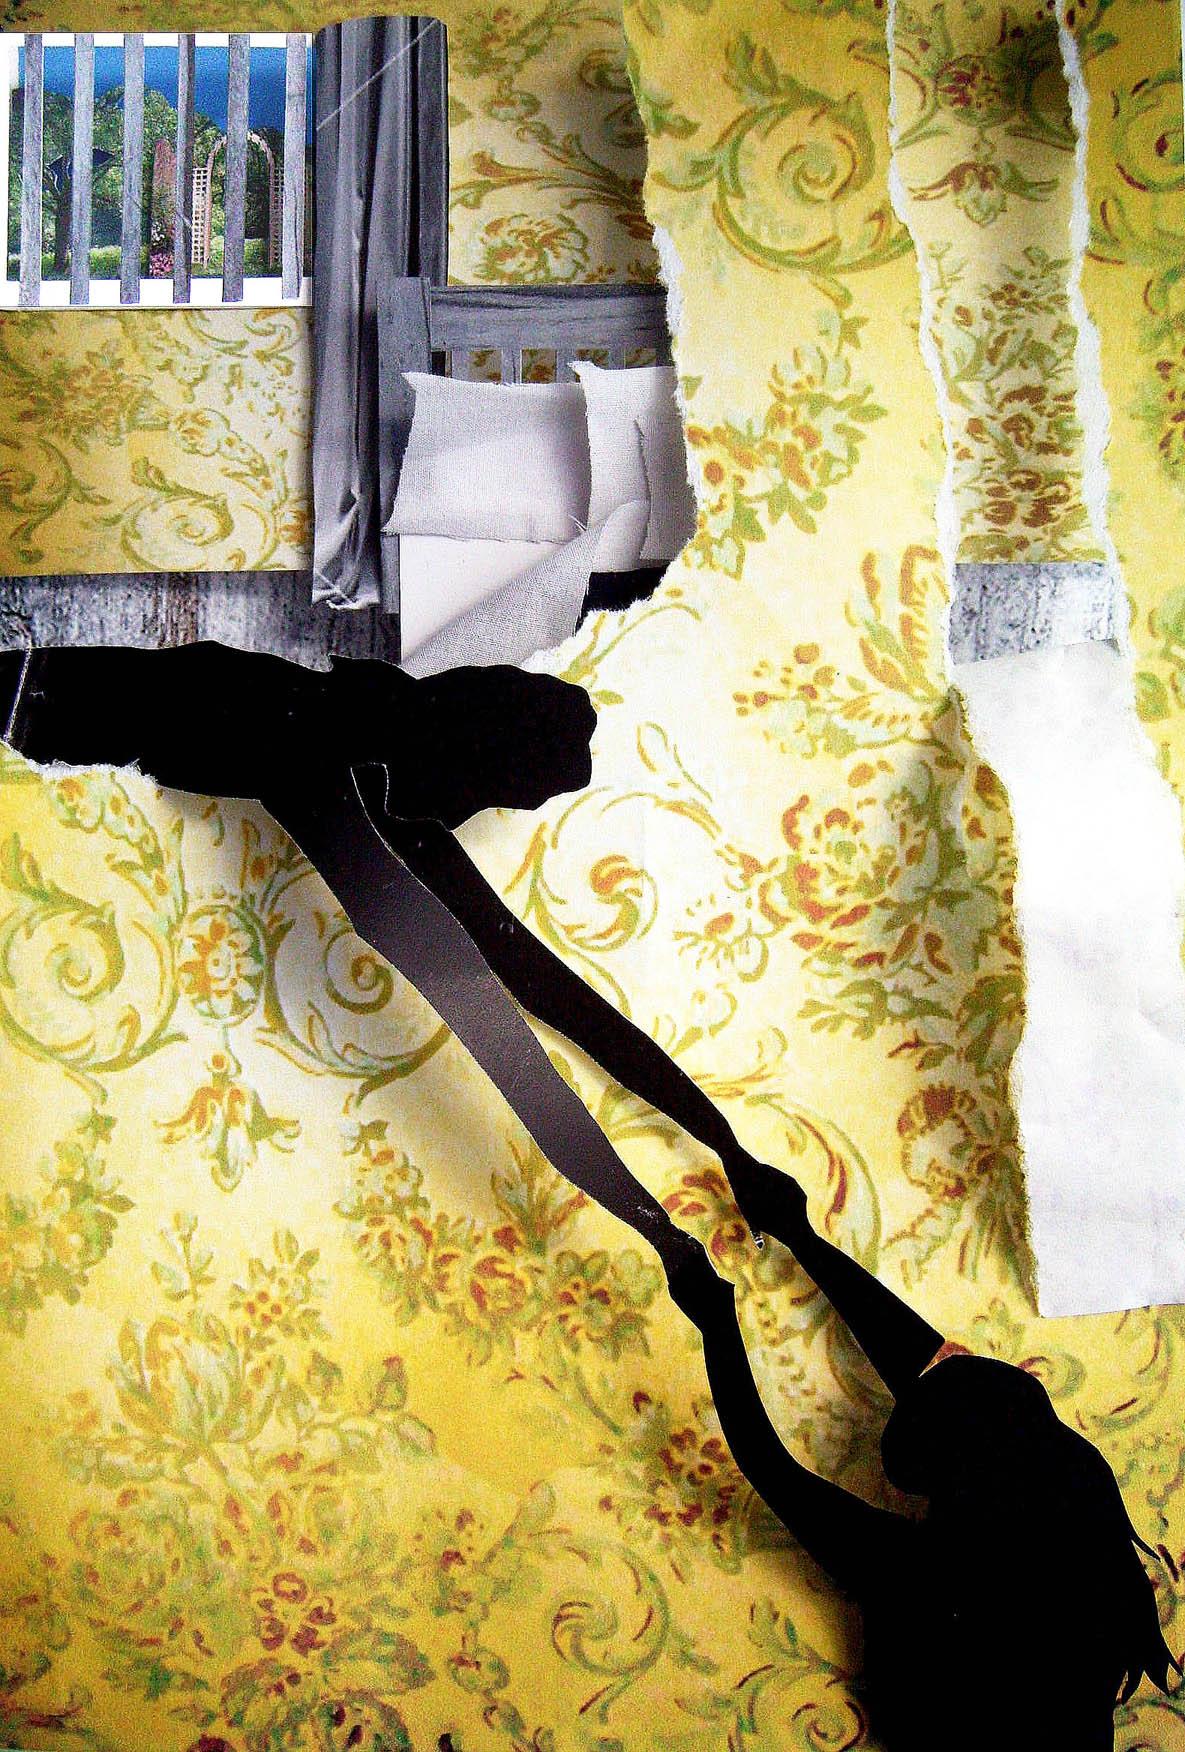 Charlotte Perkins GilmanS The Yellow Wallpaper Essay